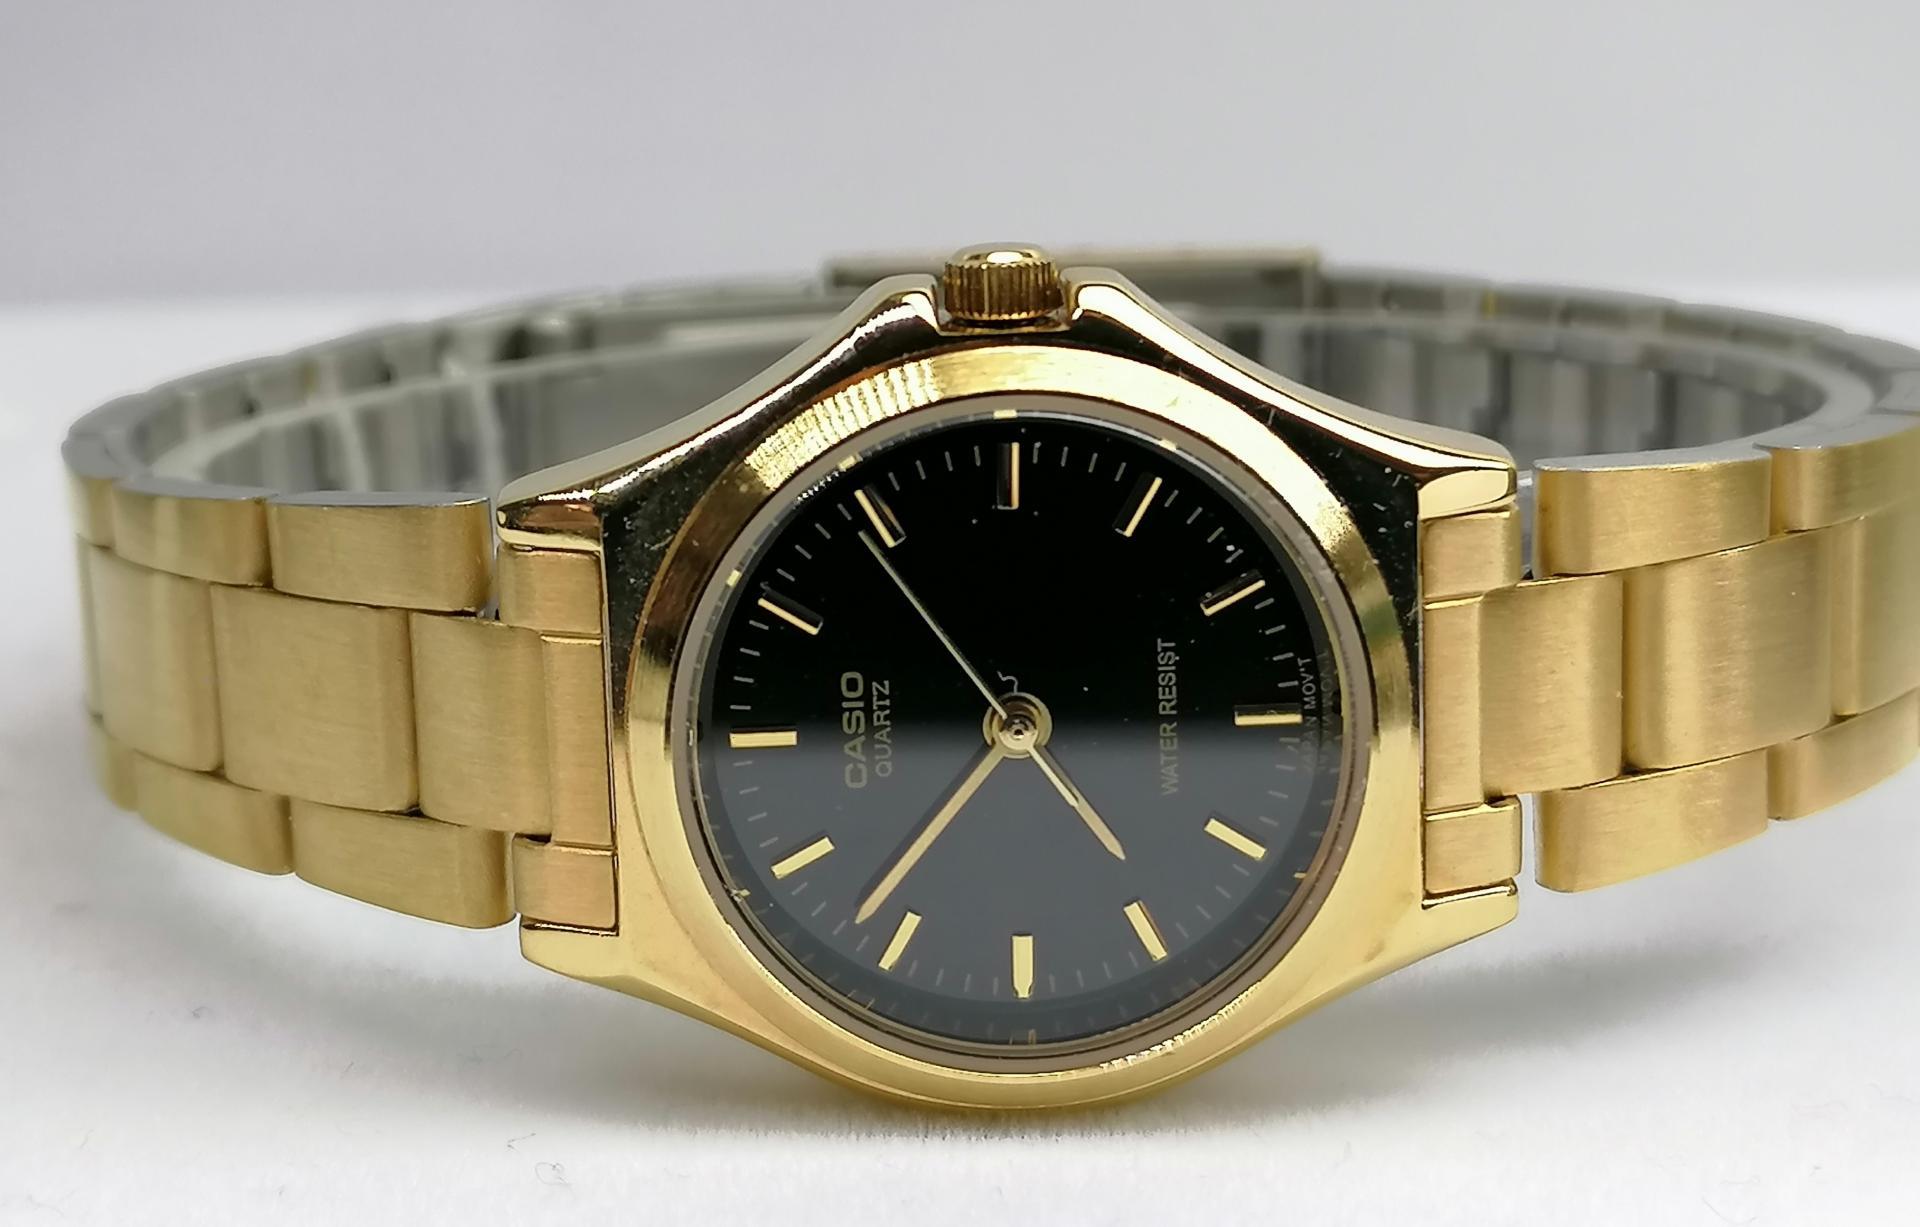 Reloj Casio Mujer Dorado Esfera Negra LTP-1130N-1ARDF